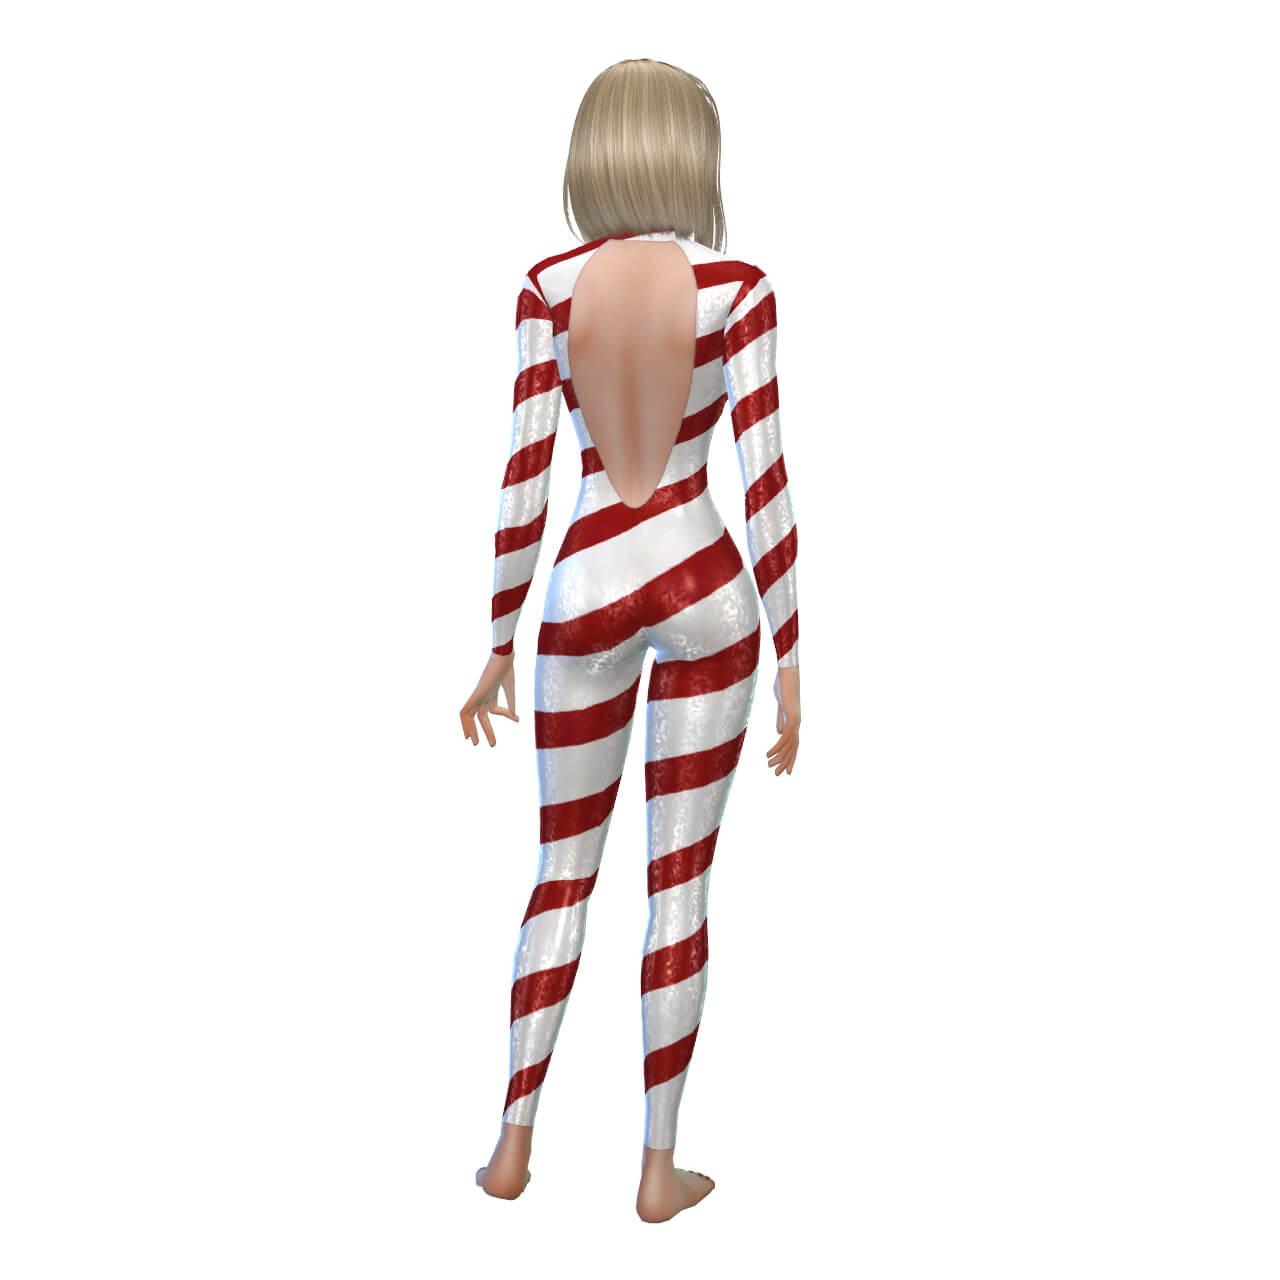 Latex Lollypop Suit